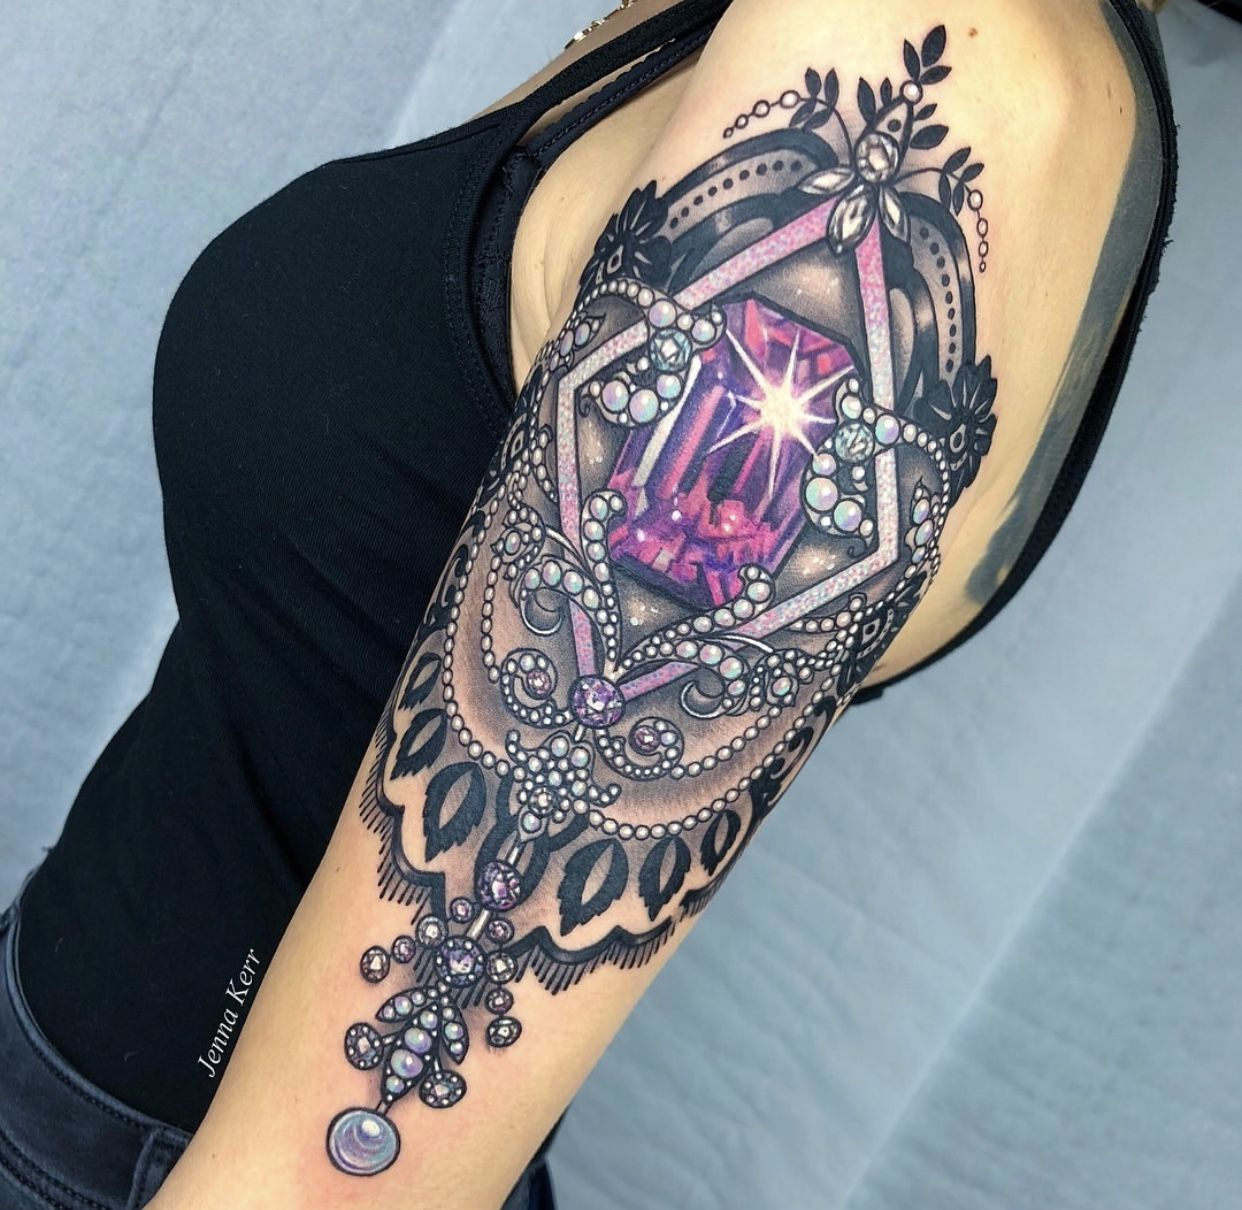 Pin By Michelle Shaker On Tatts Sleeve Tattoos For Women Unique Half Sleeve Tattoos Half Sleeve Tattoo